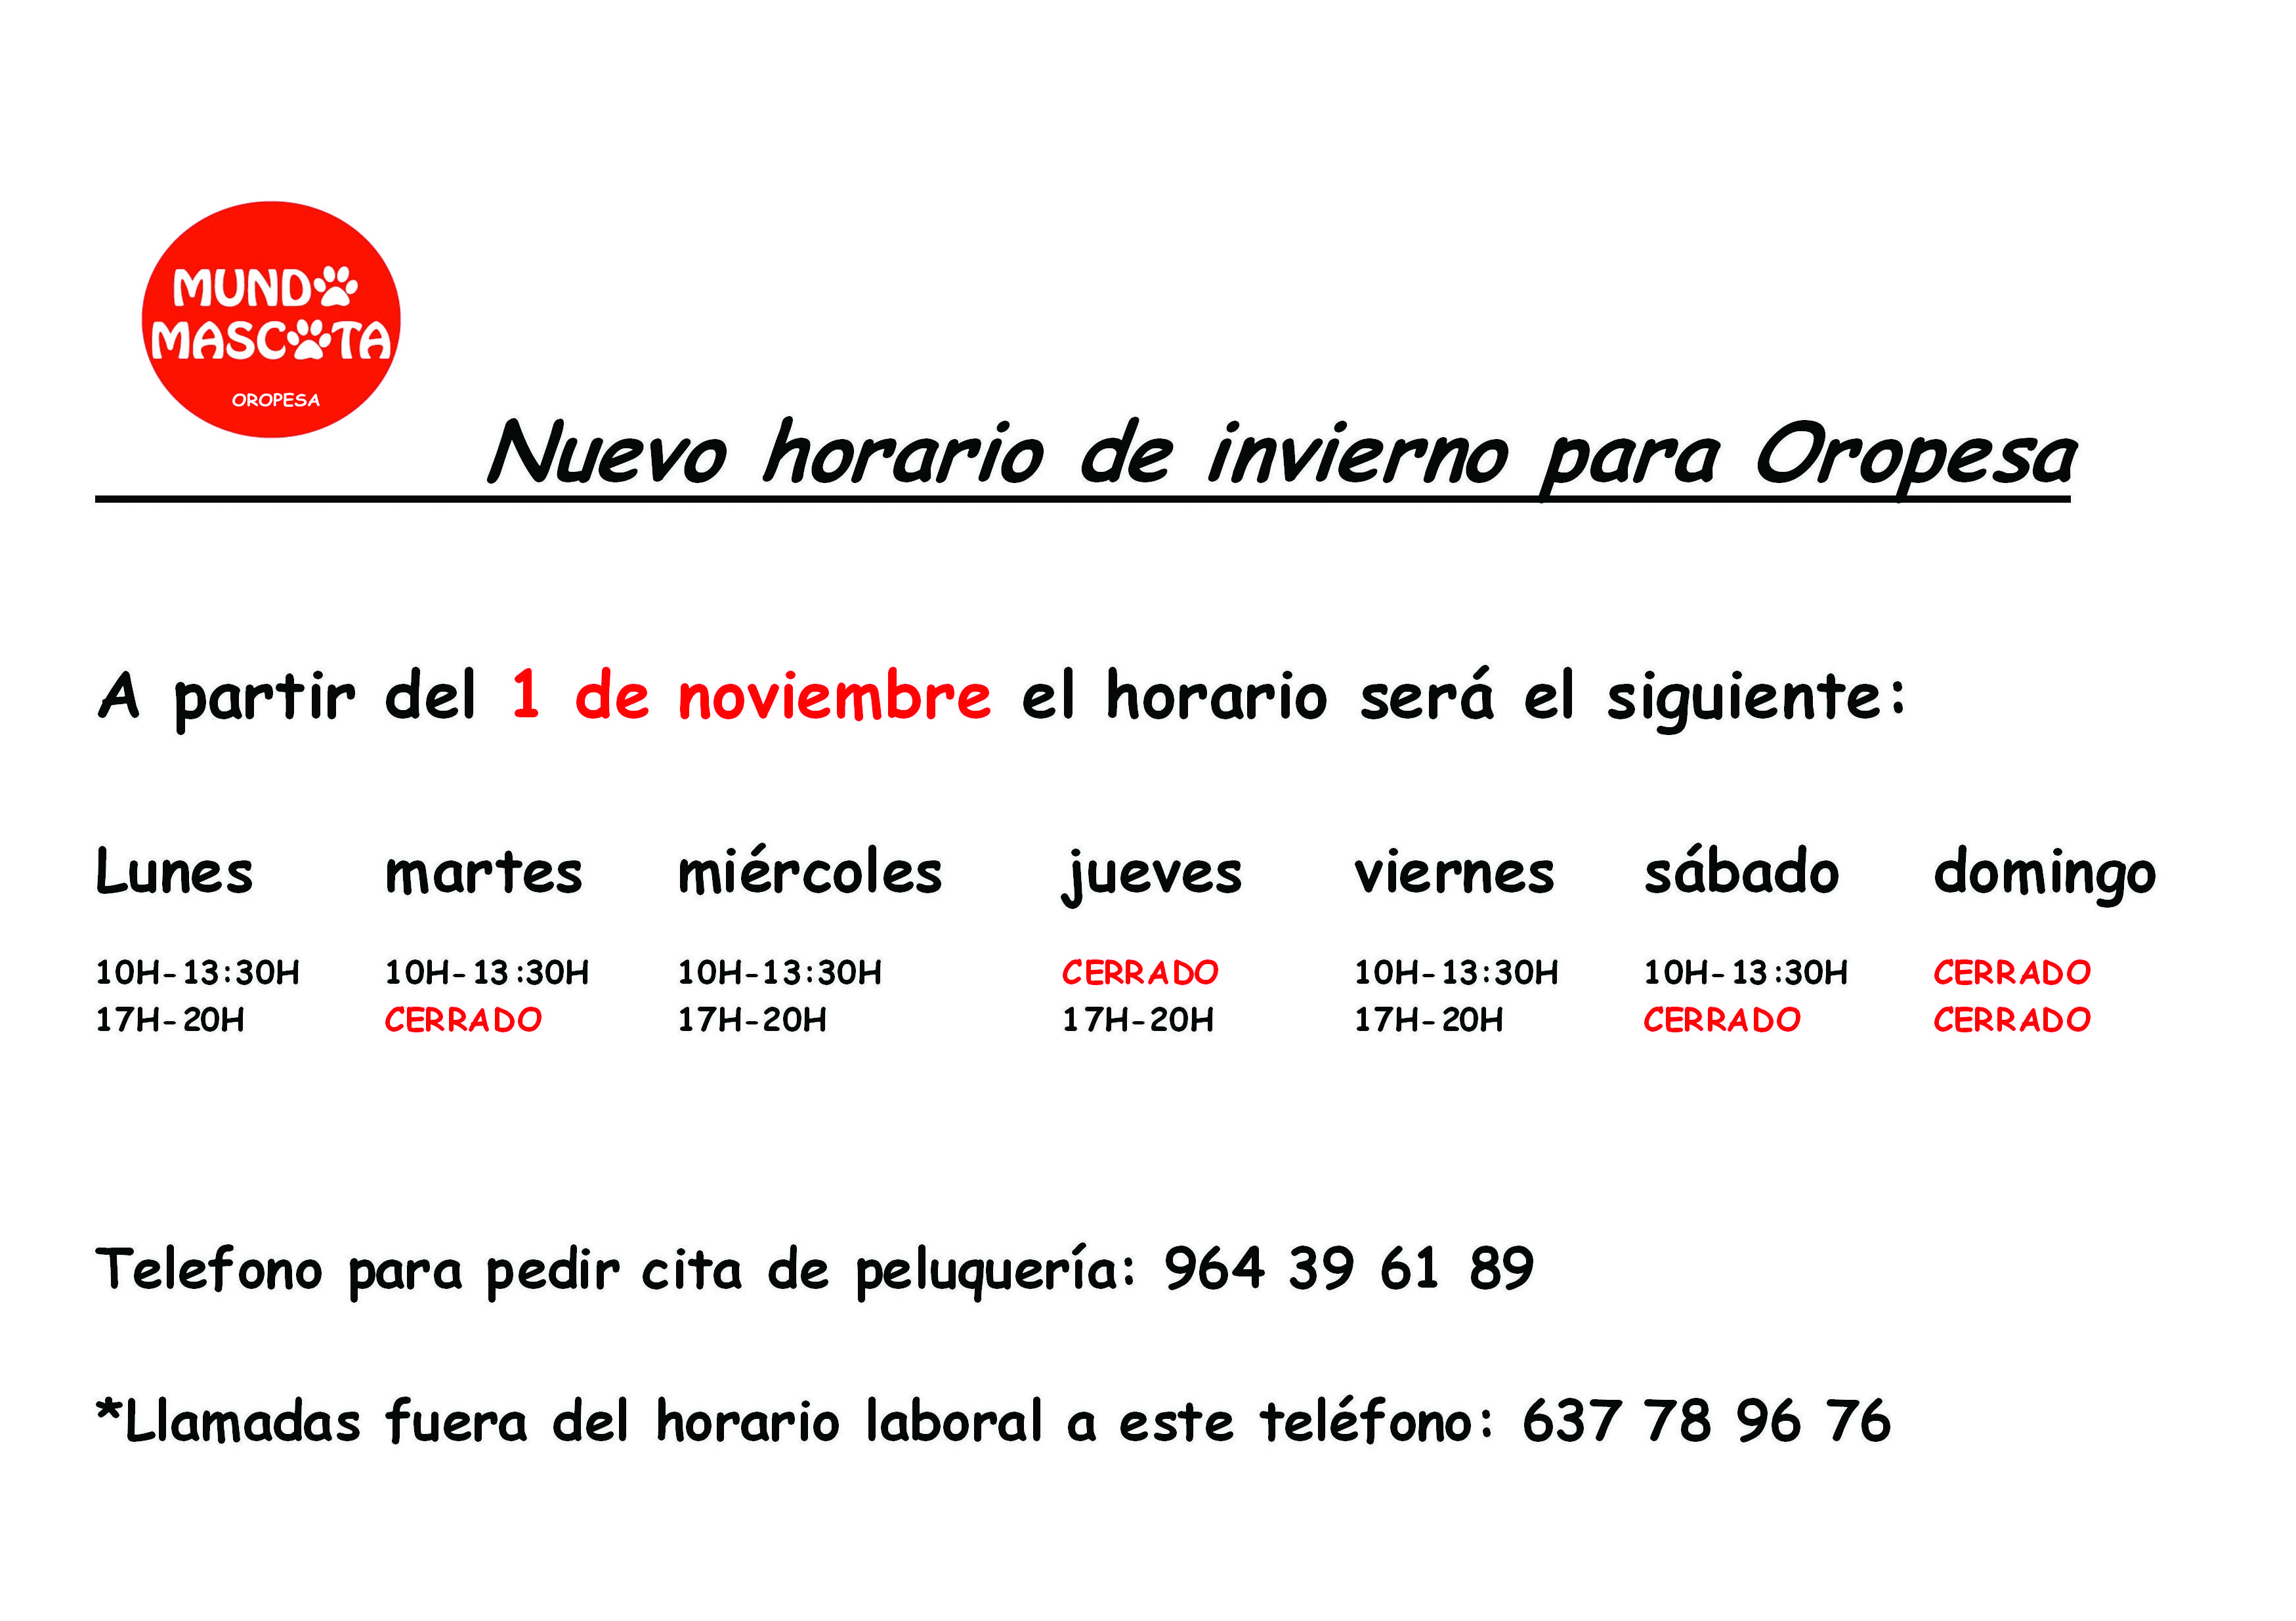 HORARIO MUNDO MASCOTA OROPESA